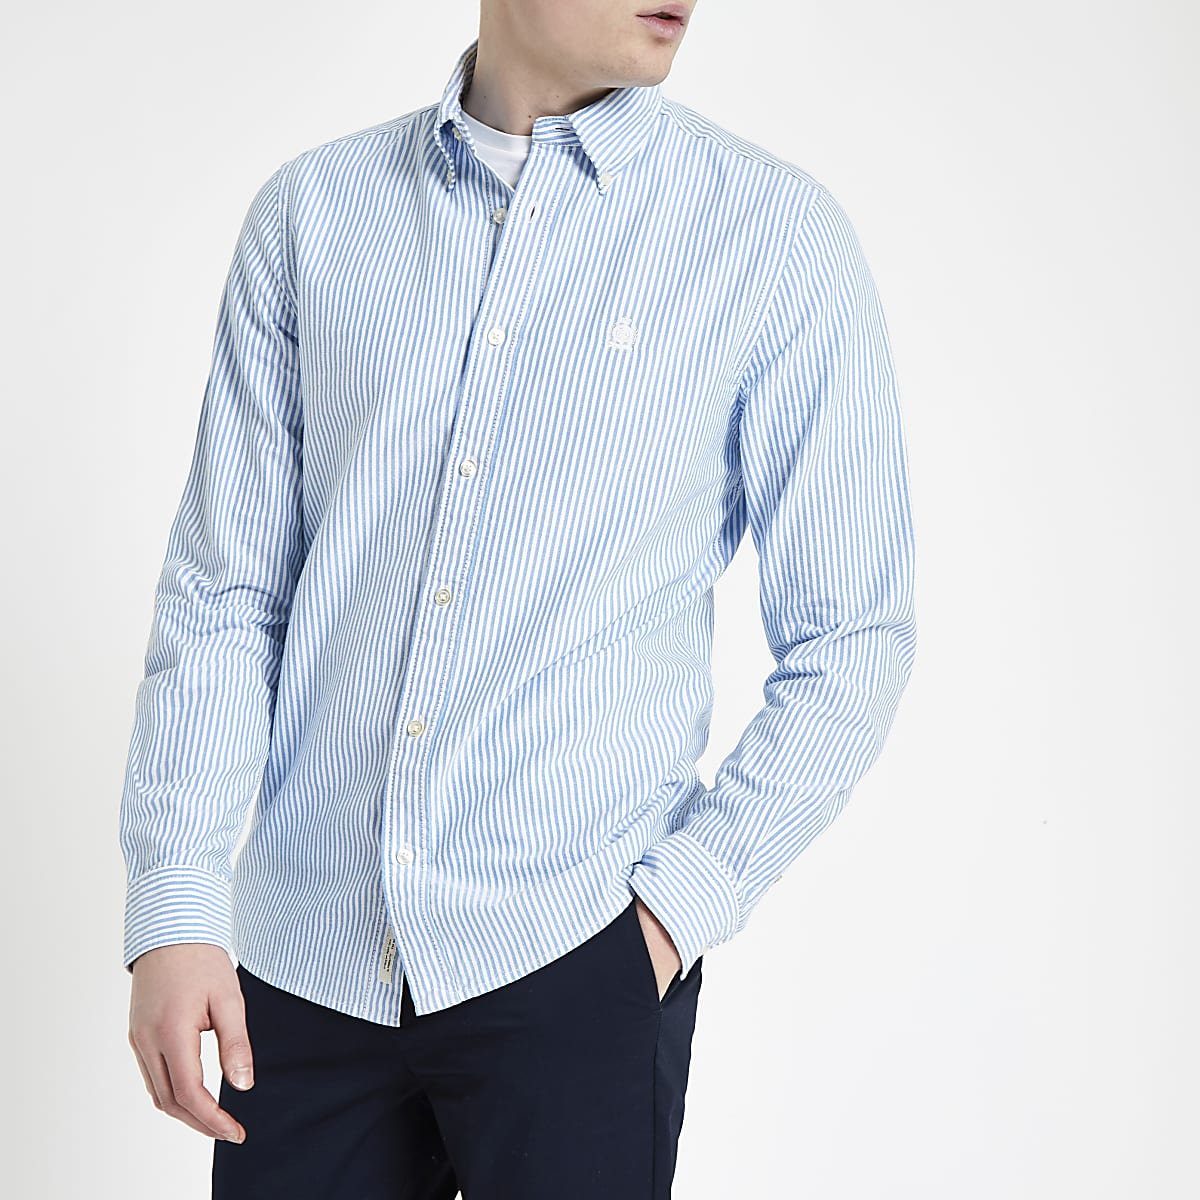 Blue stripe long sleeve Oxford shirt